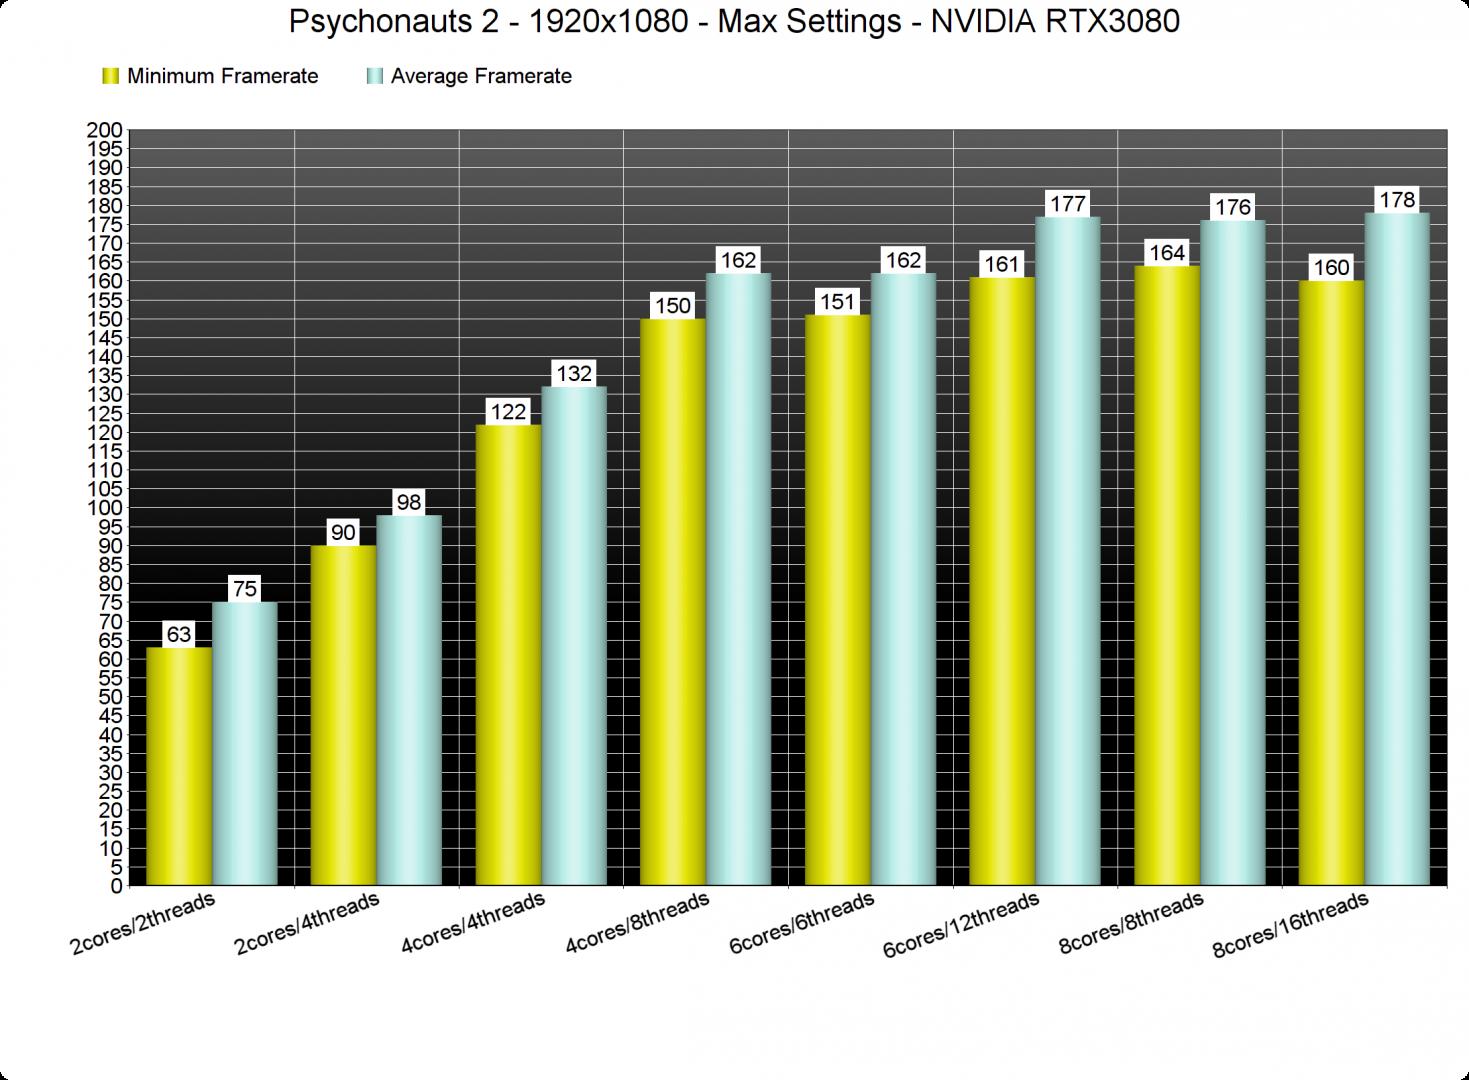 Psychonauts 2 CPU benchmarks